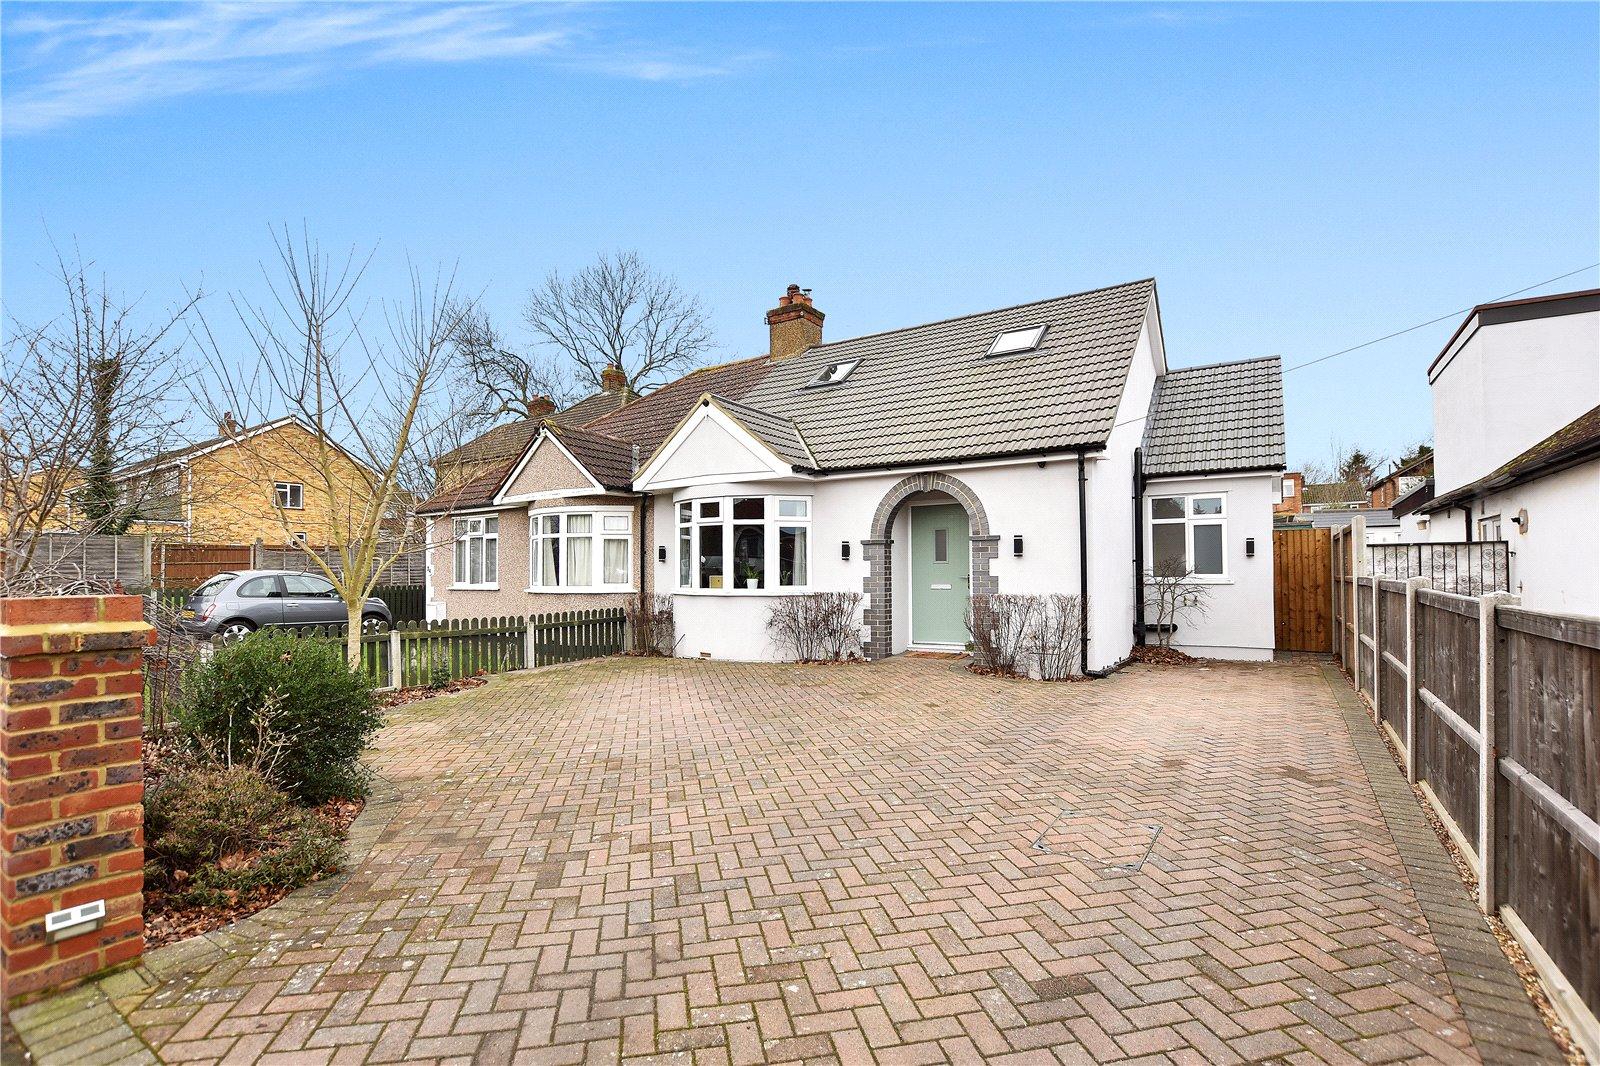 Summerhouse Drive, Bexley, Kent, DA5